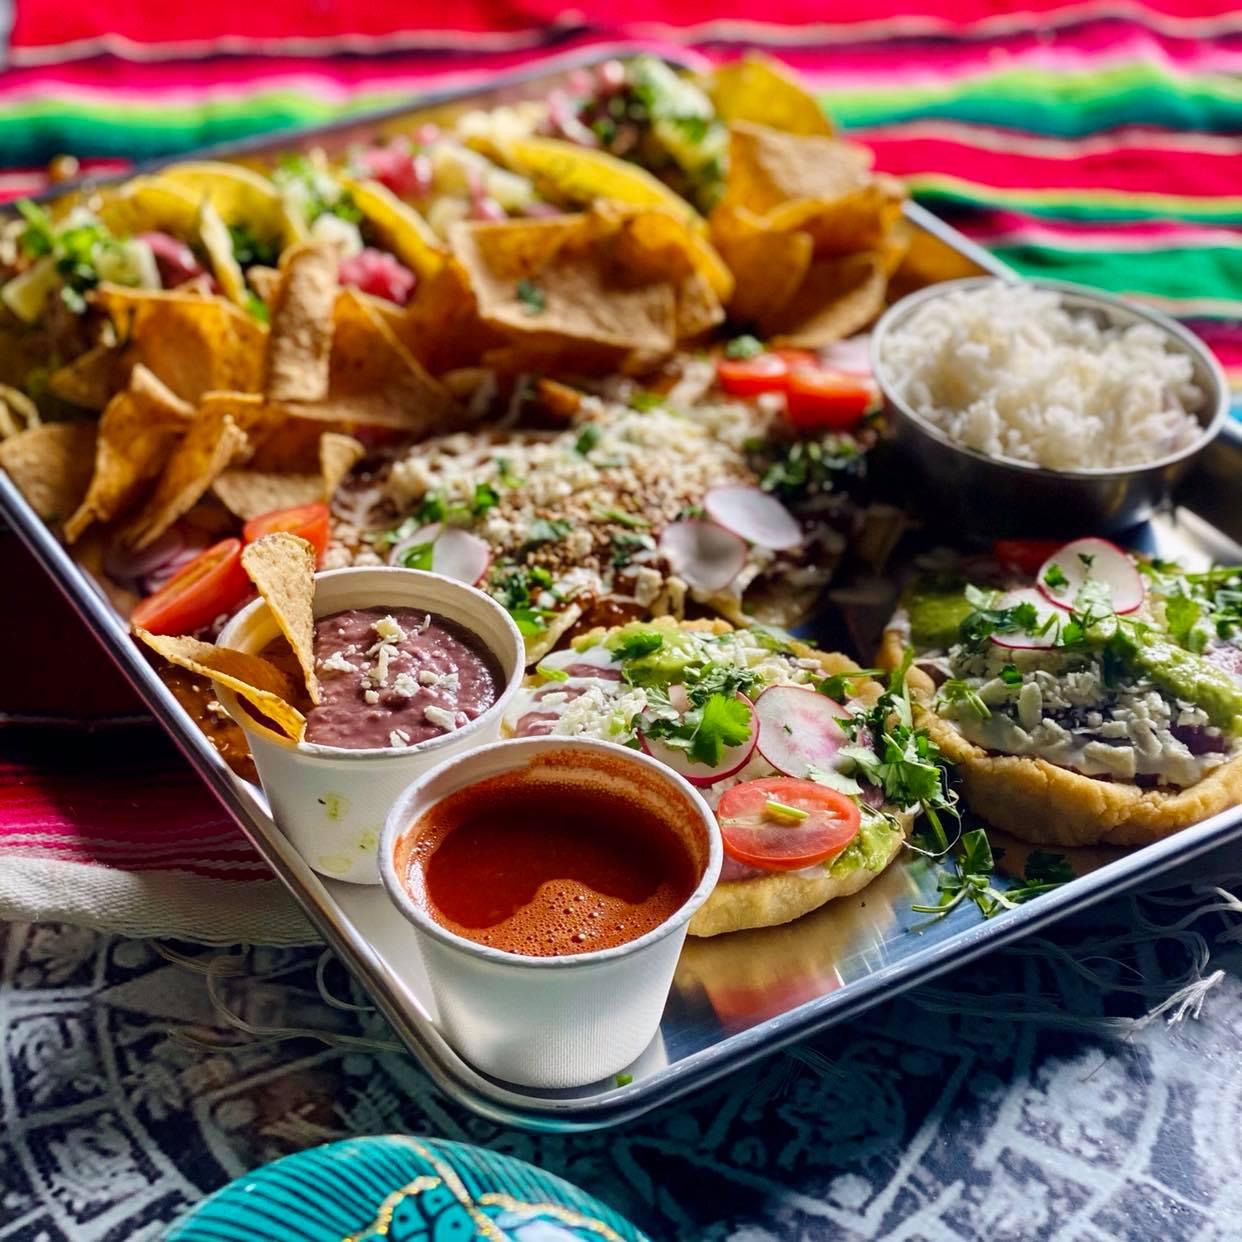 mexicain pour emporter - tequila lounge quebec